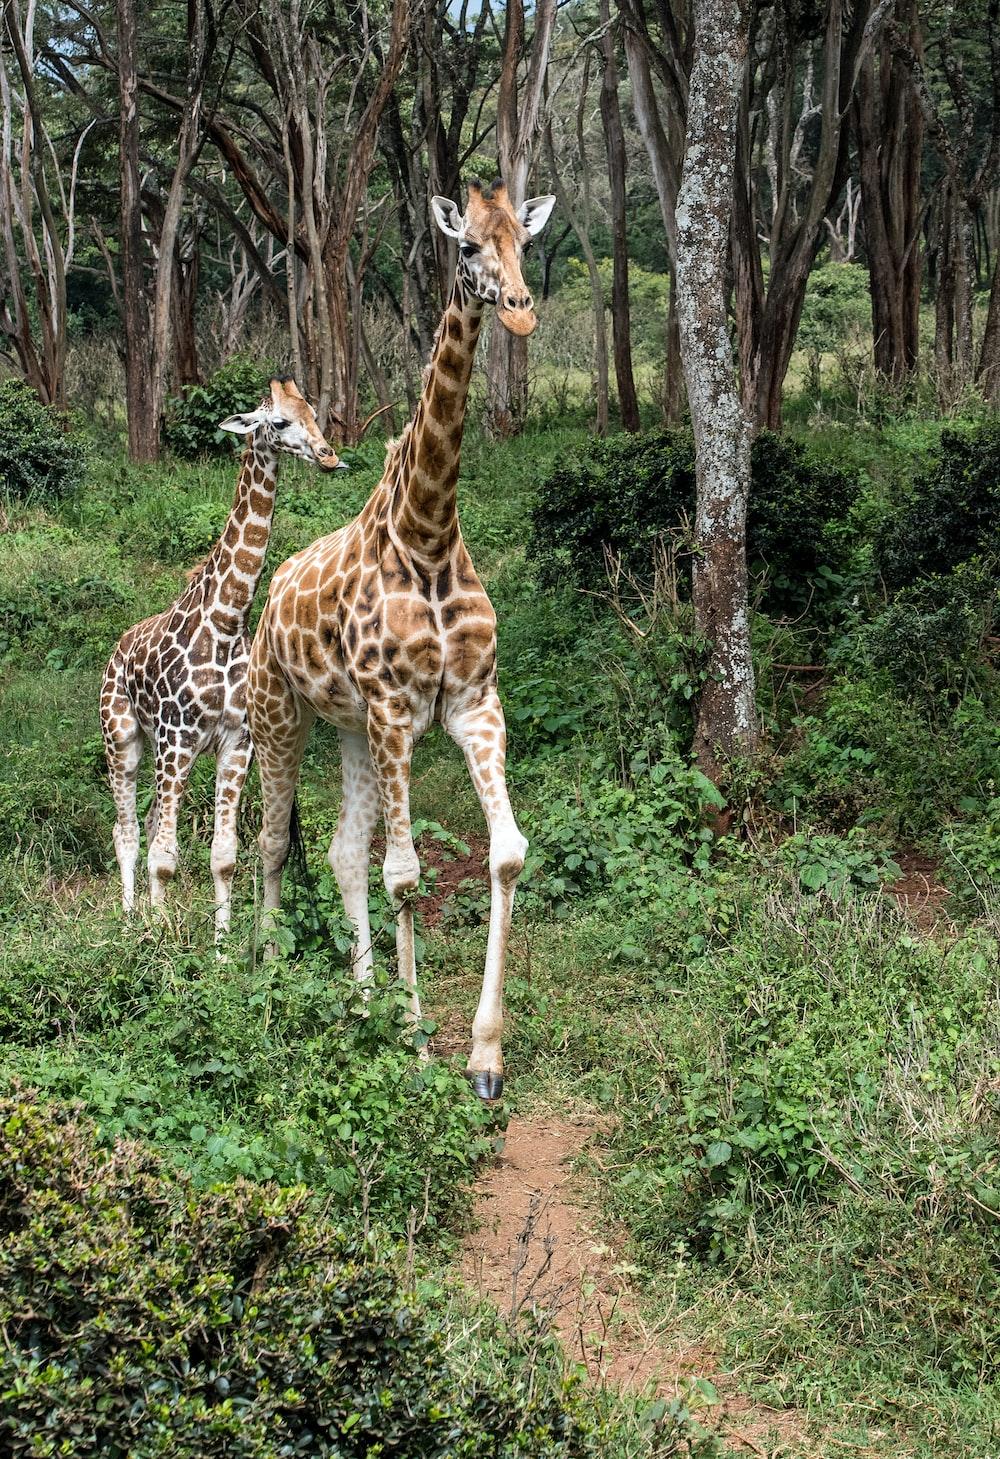 two giraffes on land